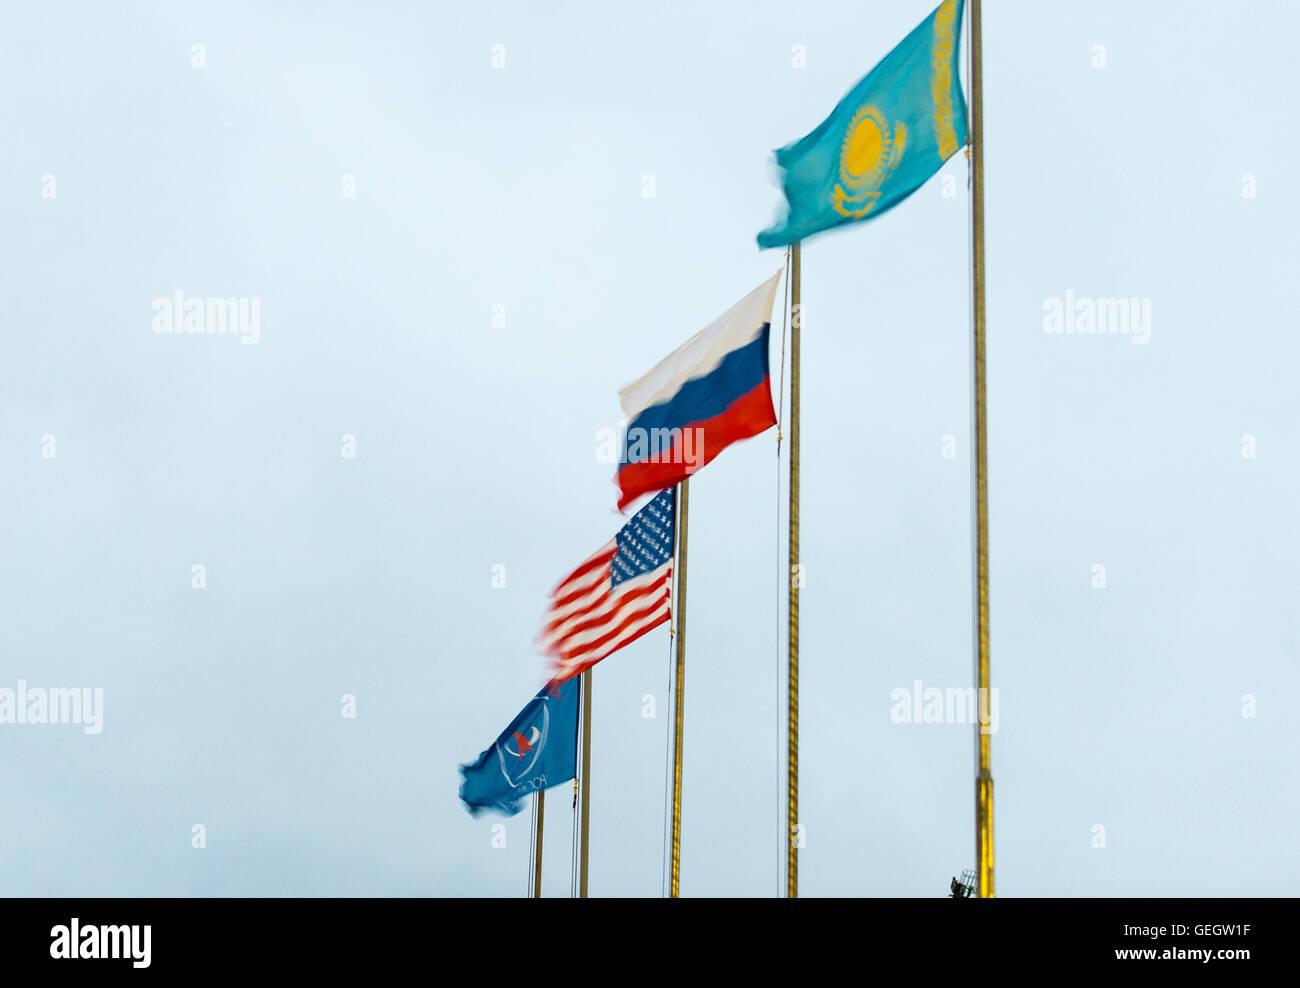 Exp 47 Soyuz Rollout  03160012 Stock Photo